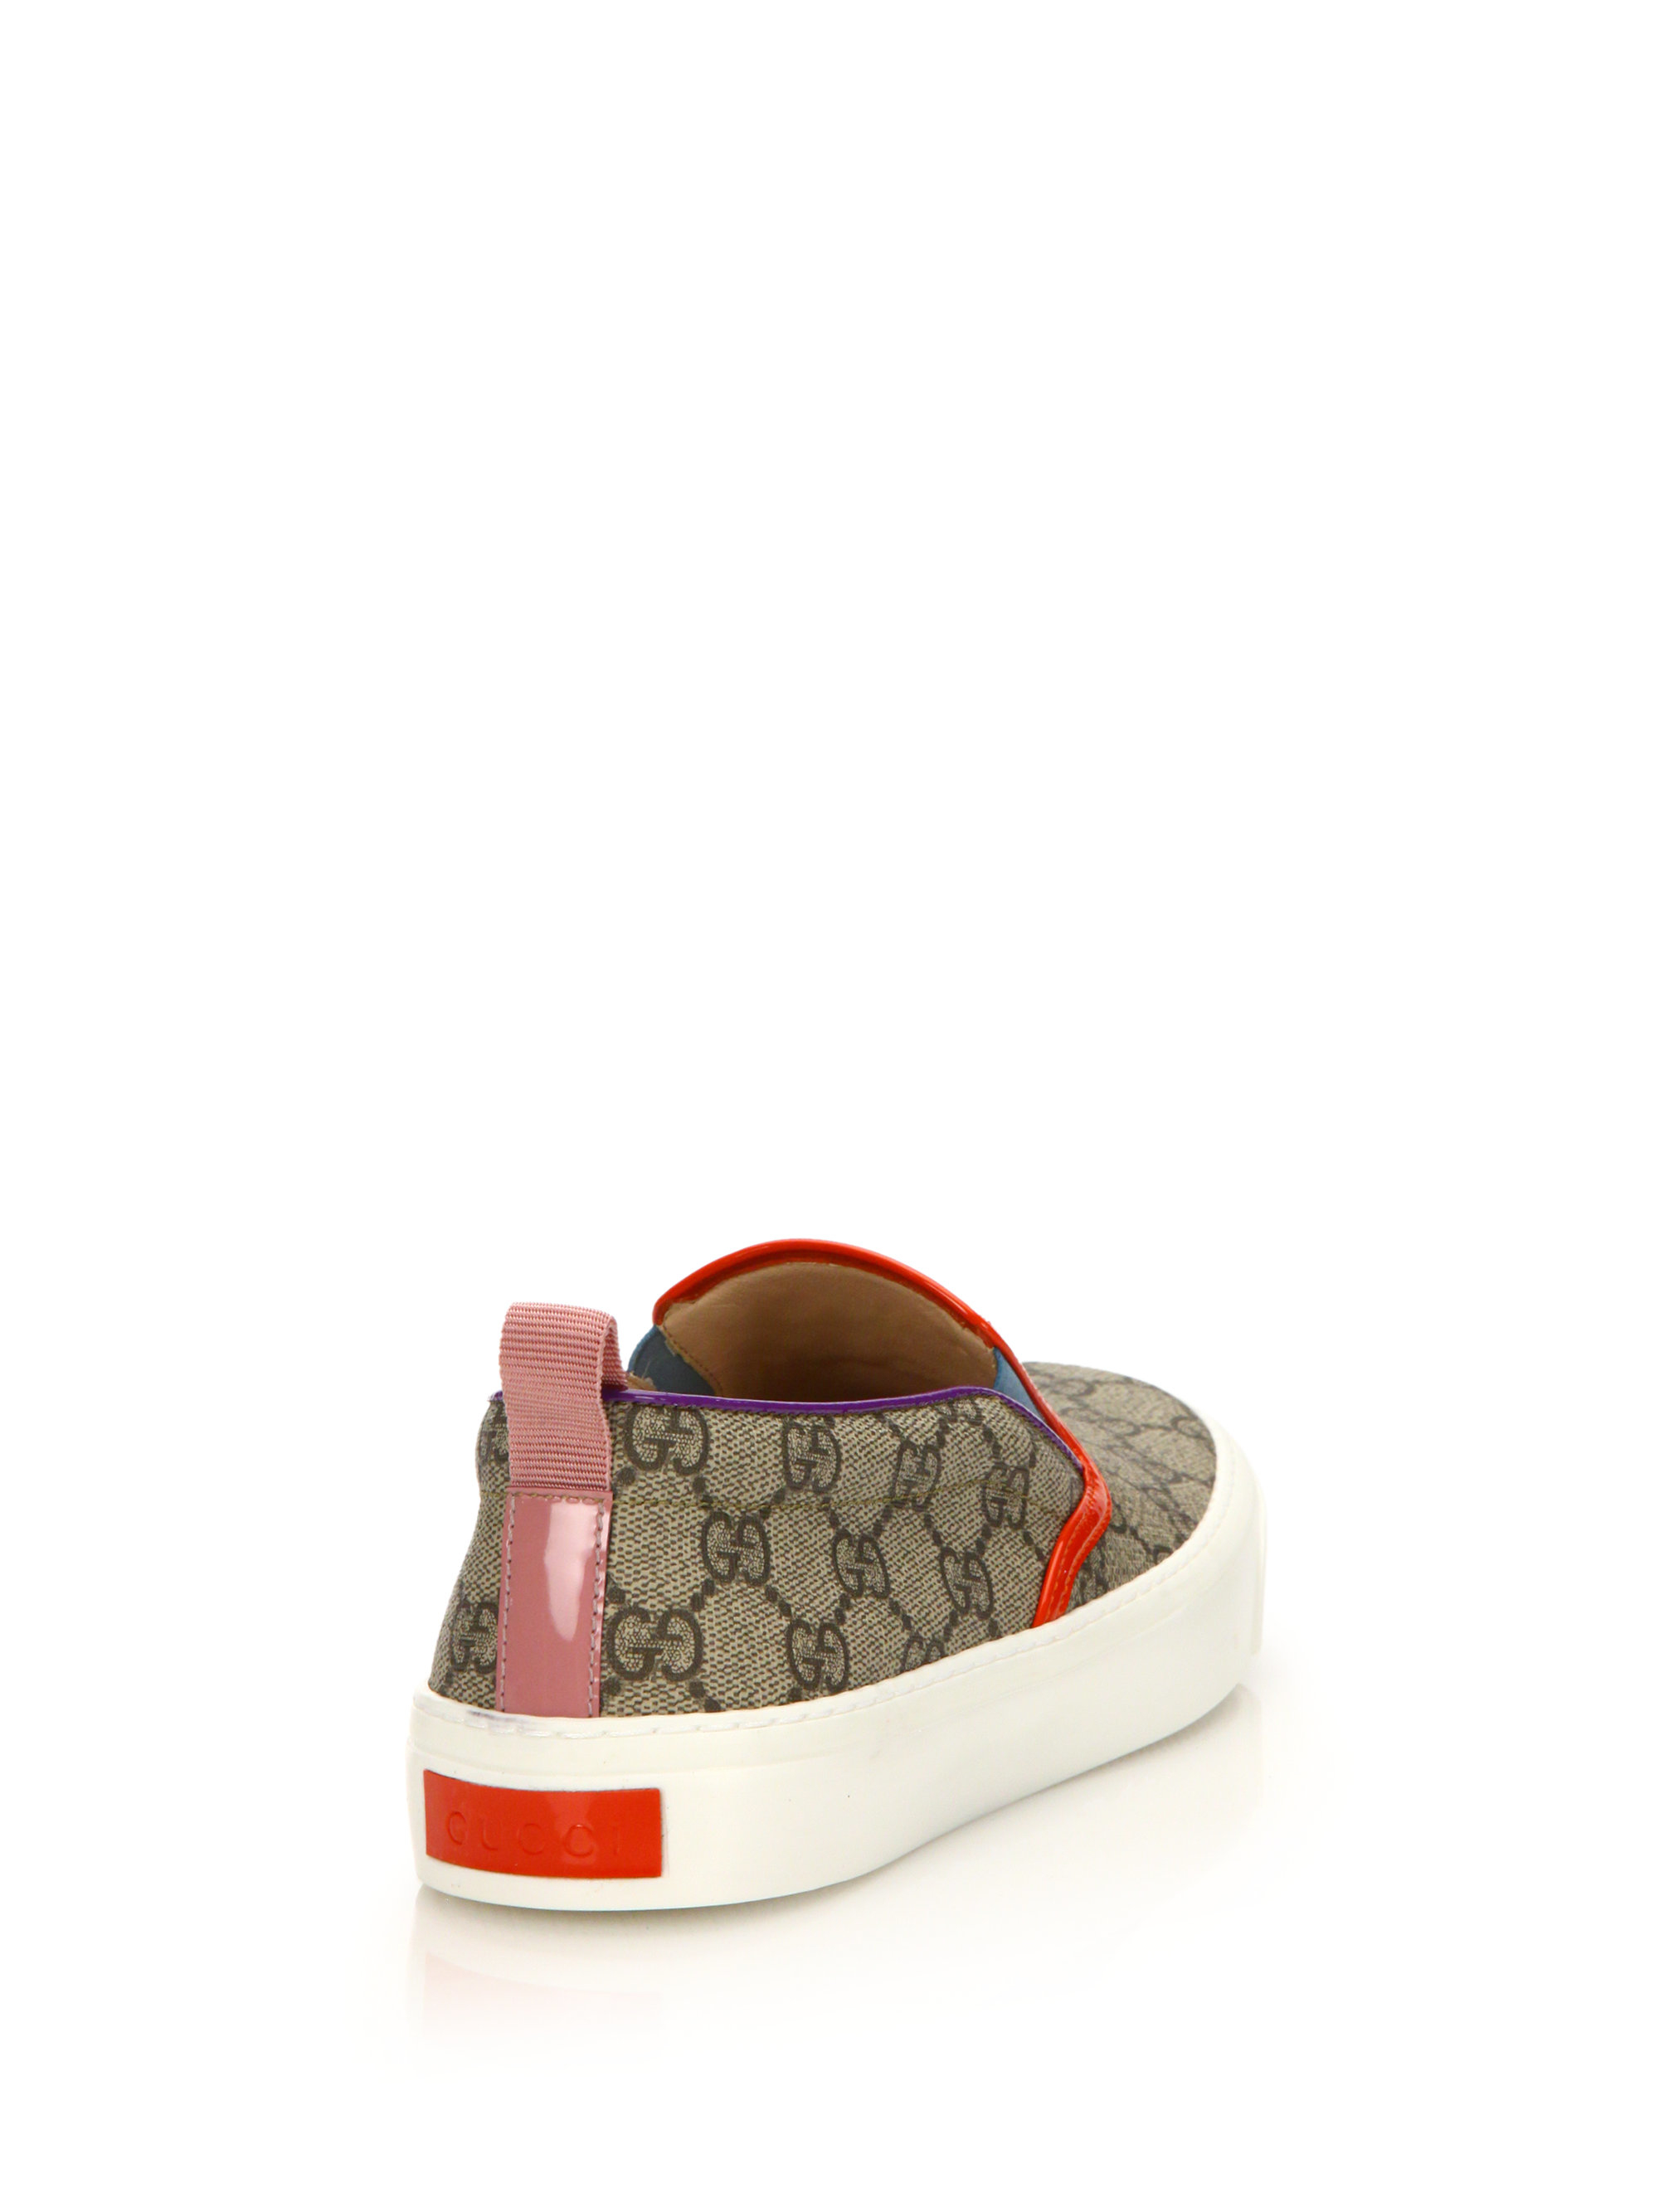 Gucci Board Gg Canvas Logo Skate Shoes